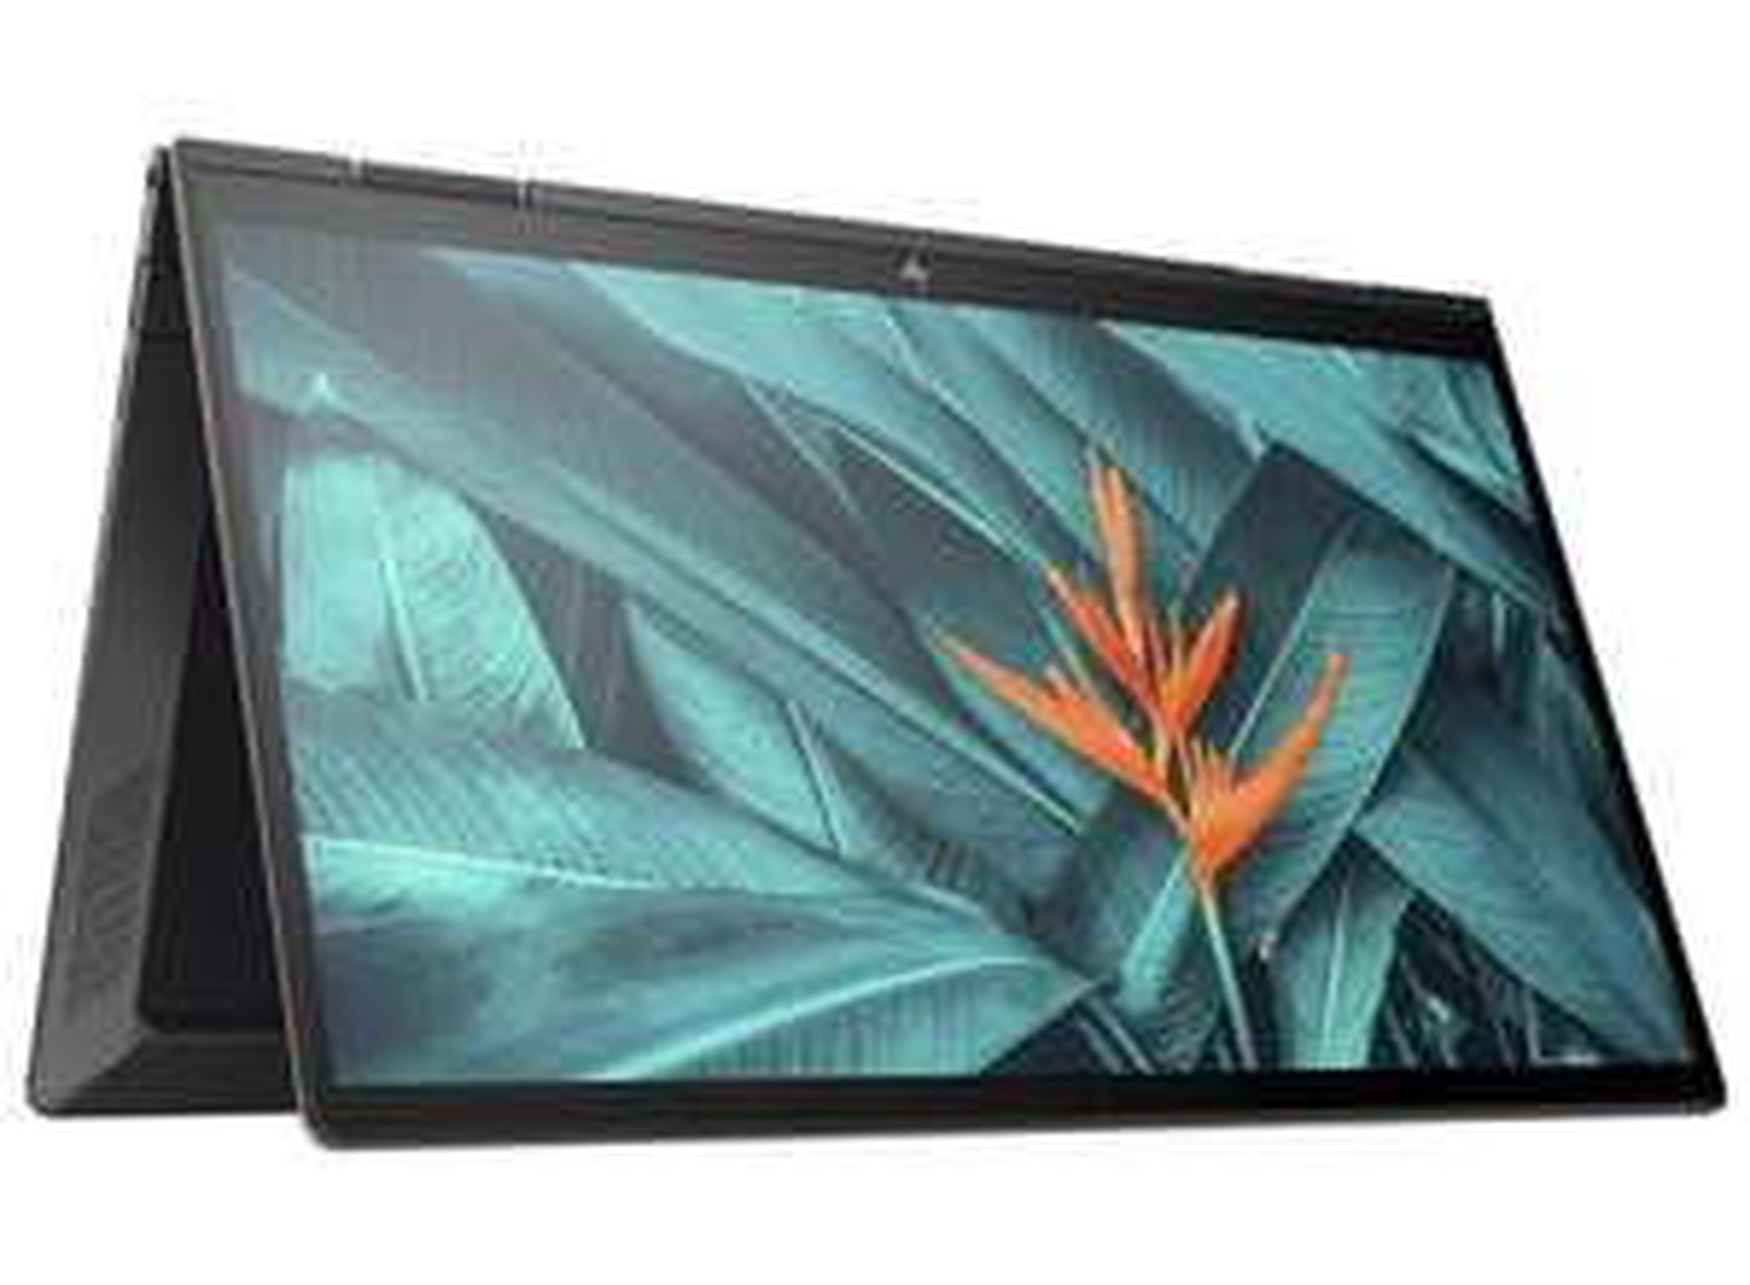 HP Envy 13″ x360 2 in 1 2020 Model – Ryzen 7 4700U, 16GB RAM, 512GB SSD £899.99 (via STUDENT DISCOUNT) @ HP Shop